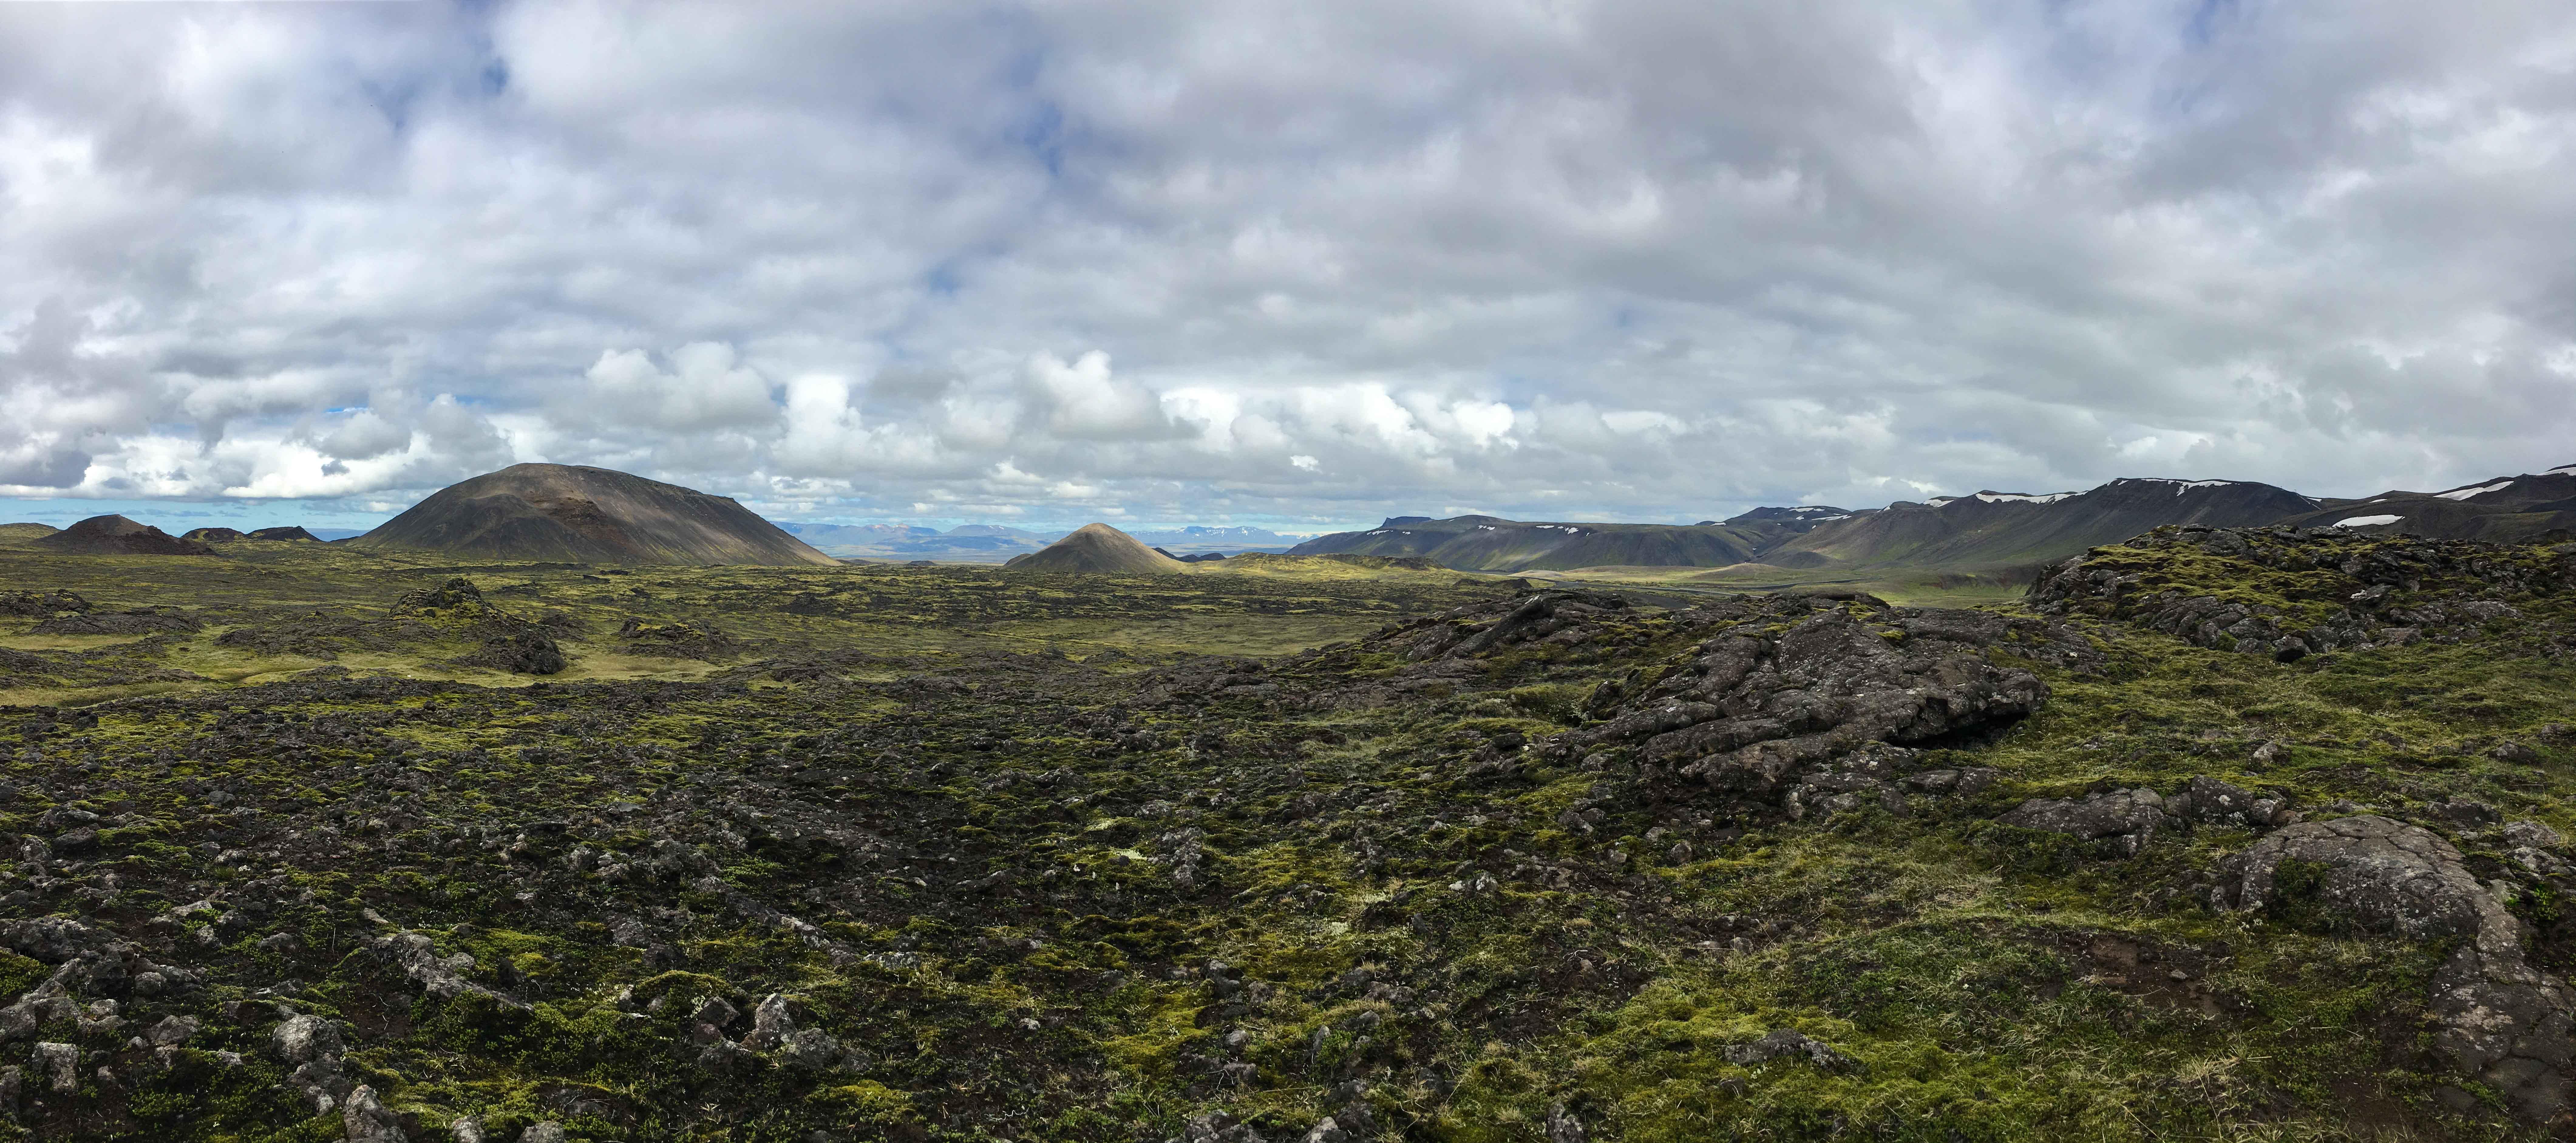 Iceland's vegetation